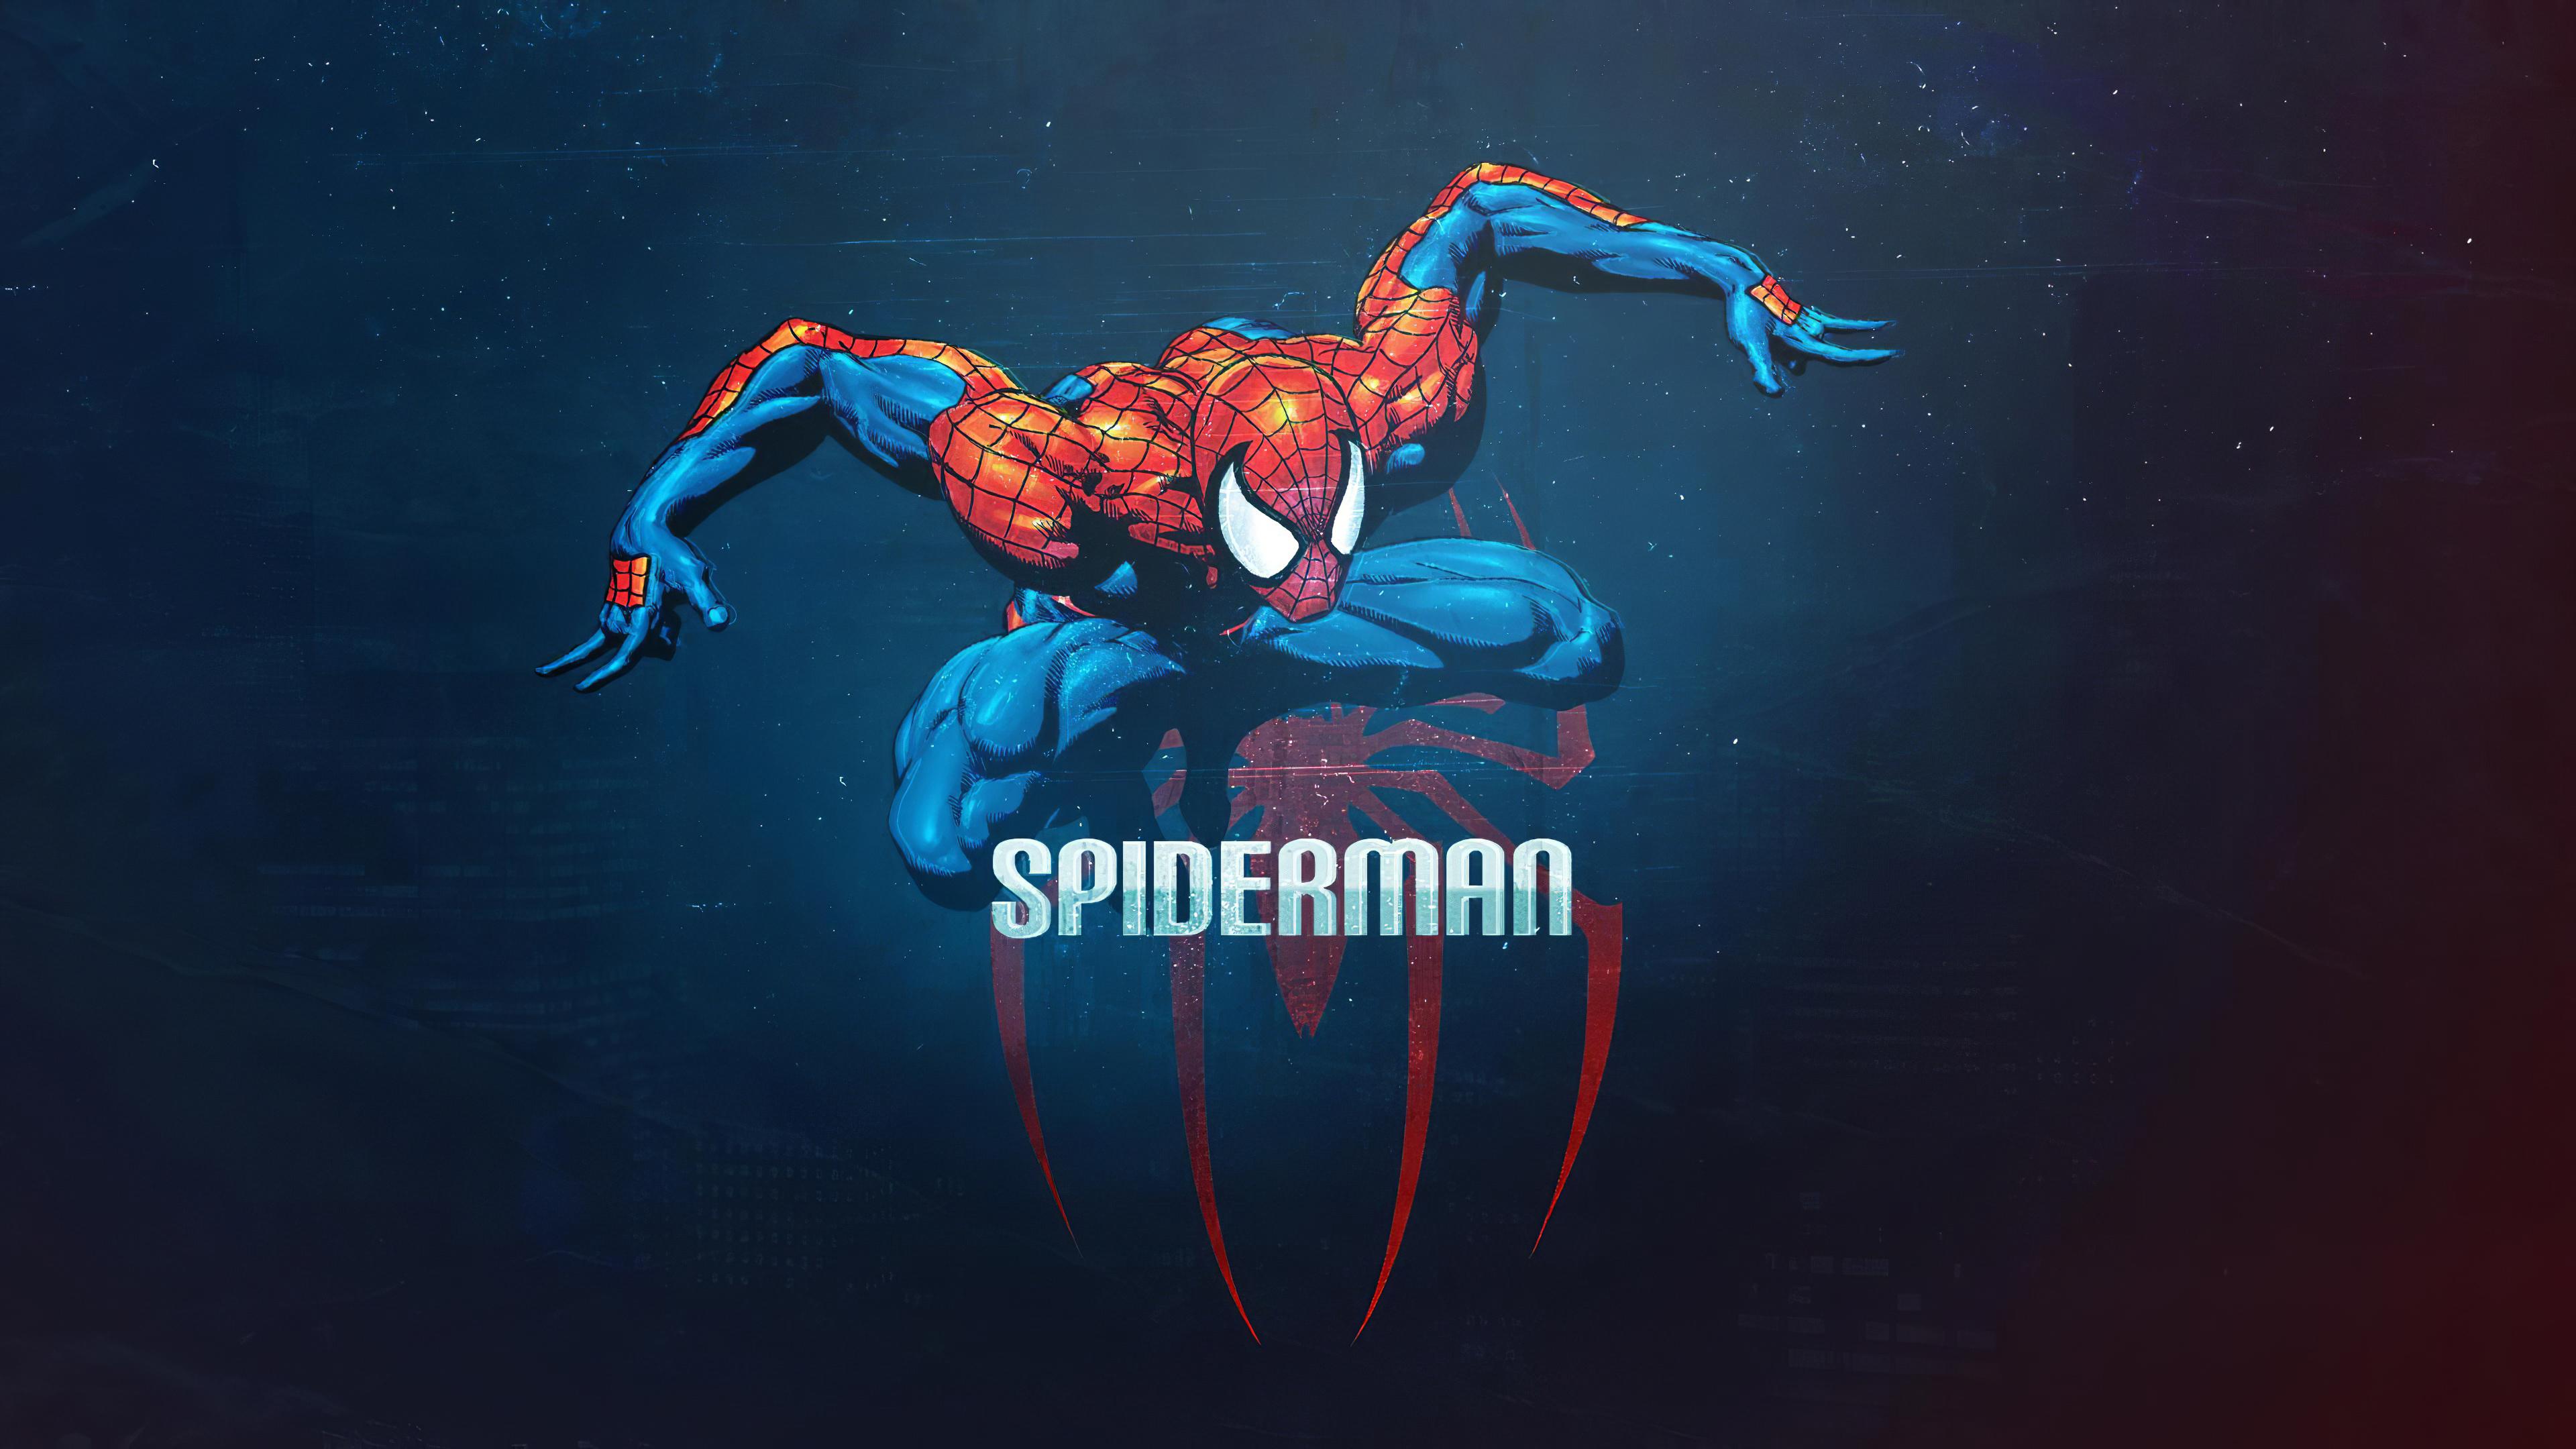 spiderman 1581356598 - Spiderman - Spider man wallpapers, spider man wallpaper phone 4k hd, spider man background hd 4k, spider man 4k wallpaper